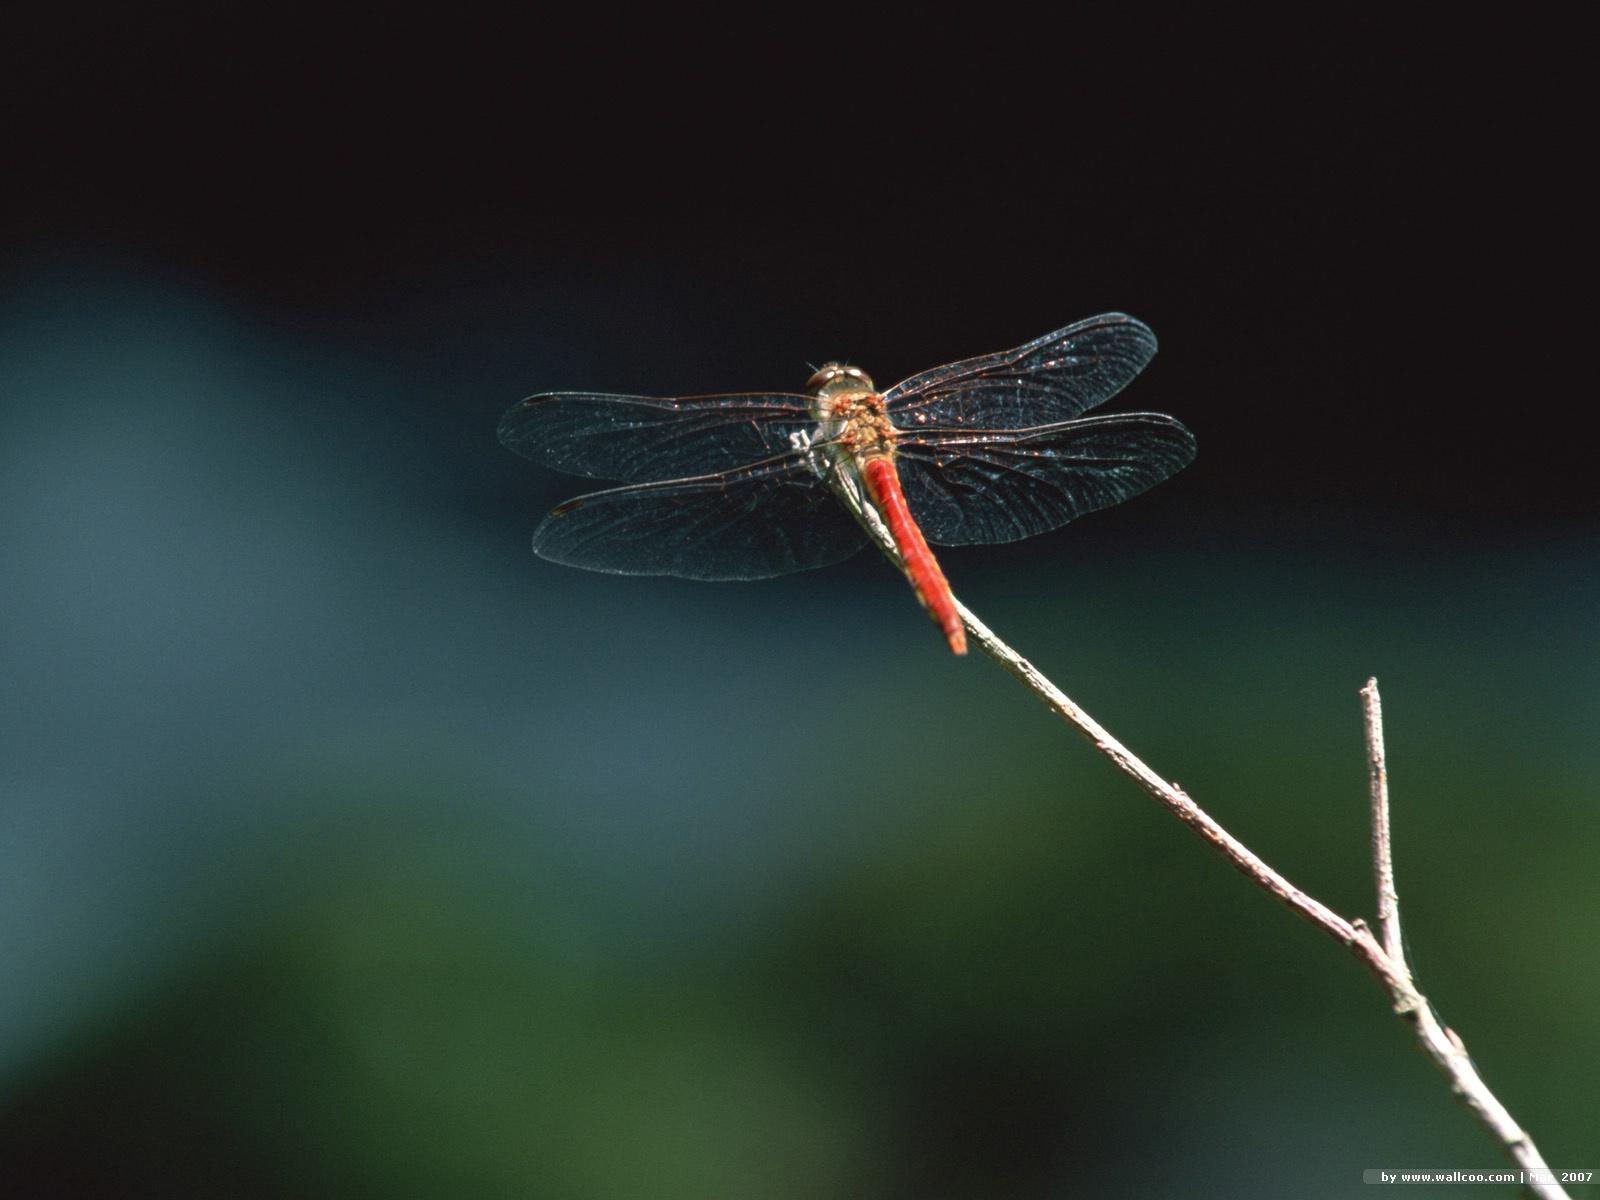 dragonfly wallpaper dragonfly EA55114jpg 1600x1200